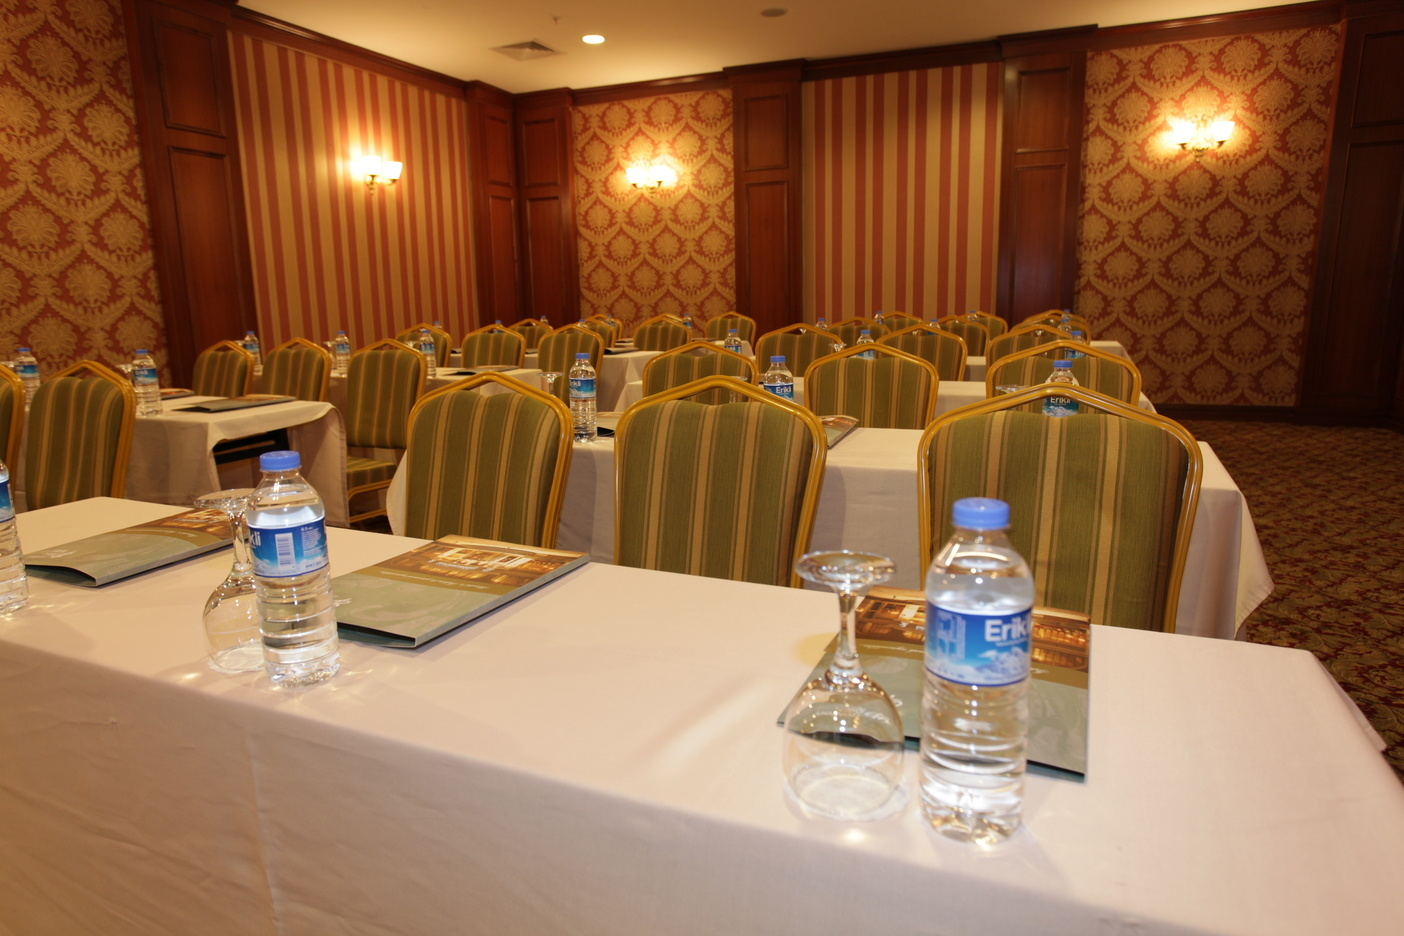 Image Golden_Park_Meeting_room1.JPG